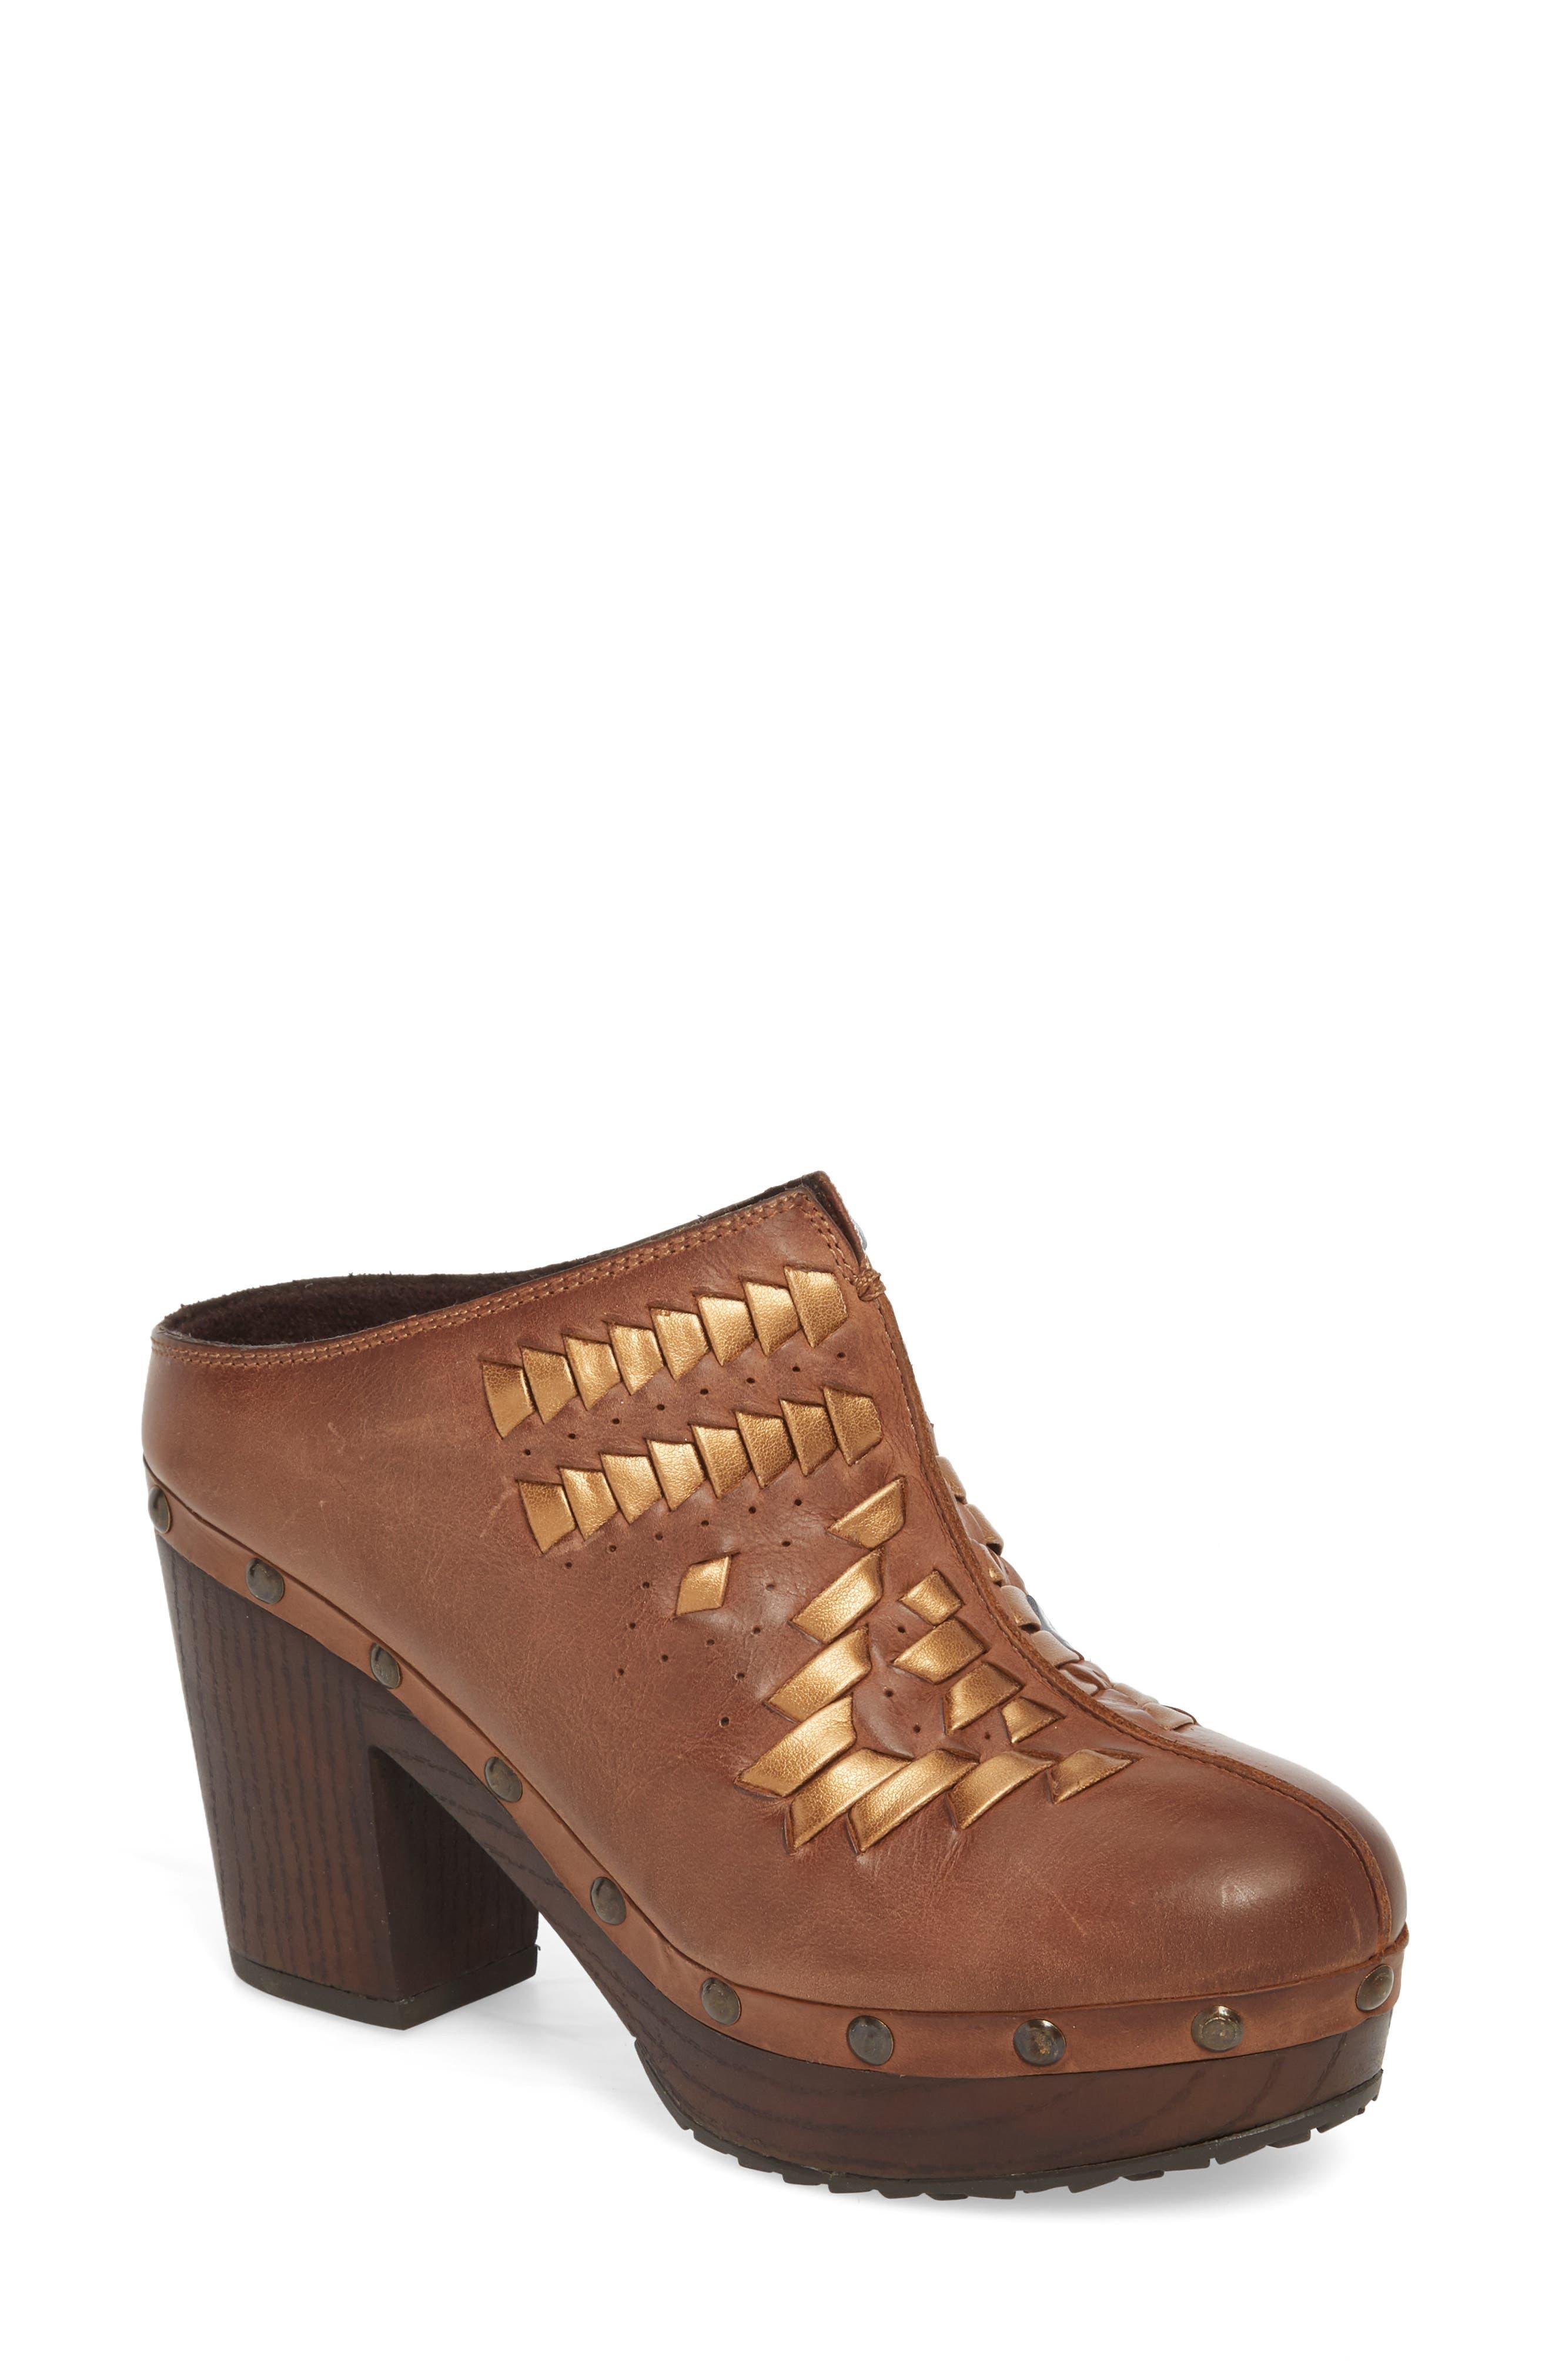 Bria Platform Clog,                         Main,                         color, Bronzed Brown Leather